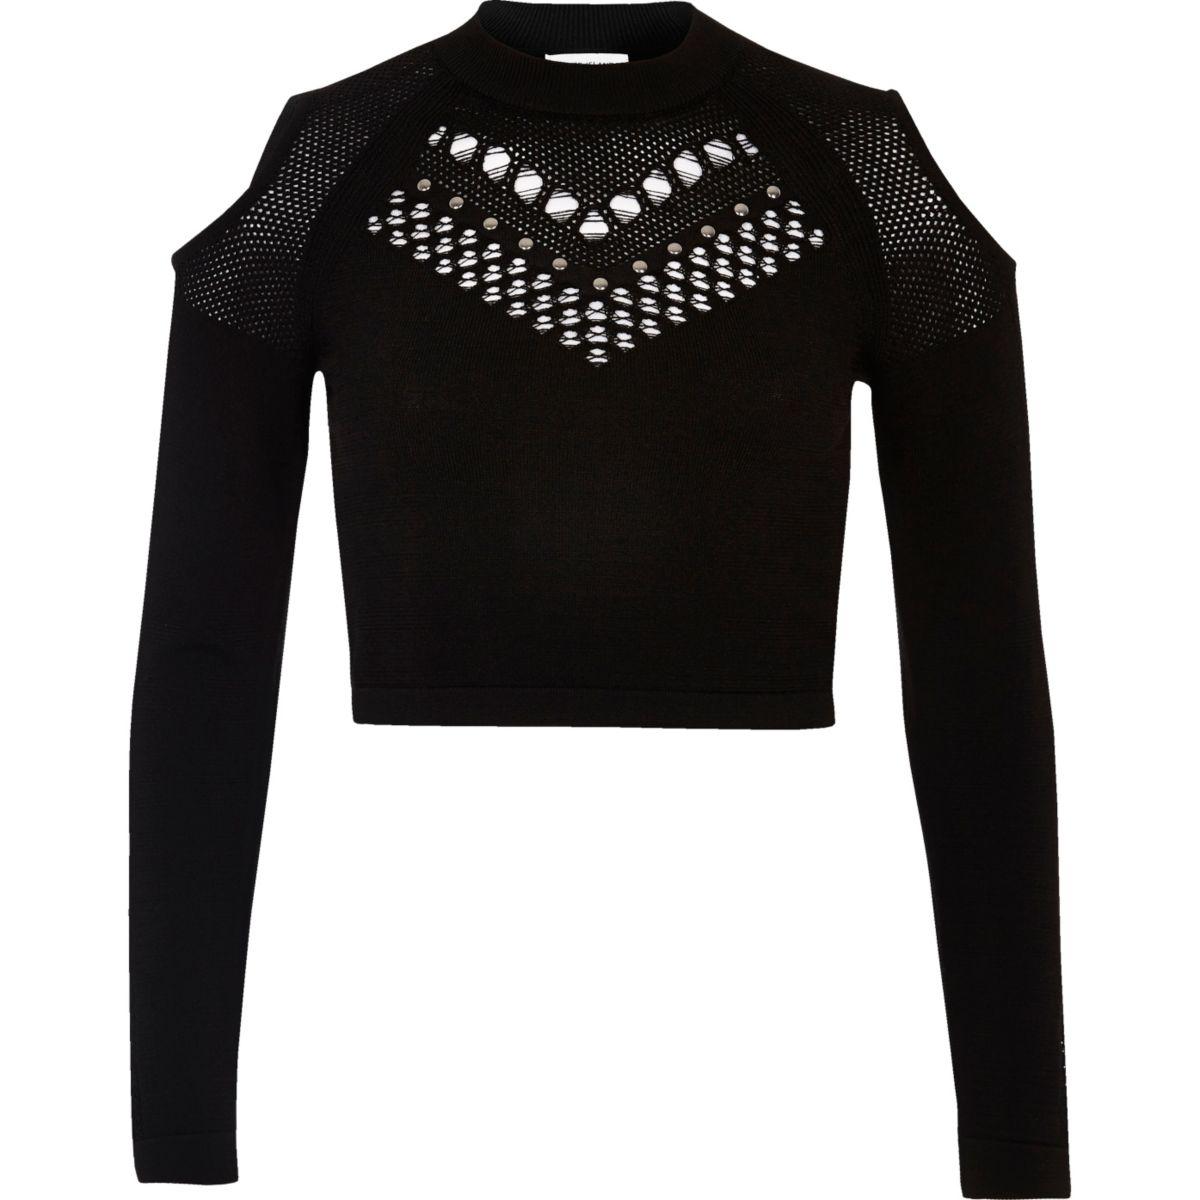 Black studded mesh knit crop top